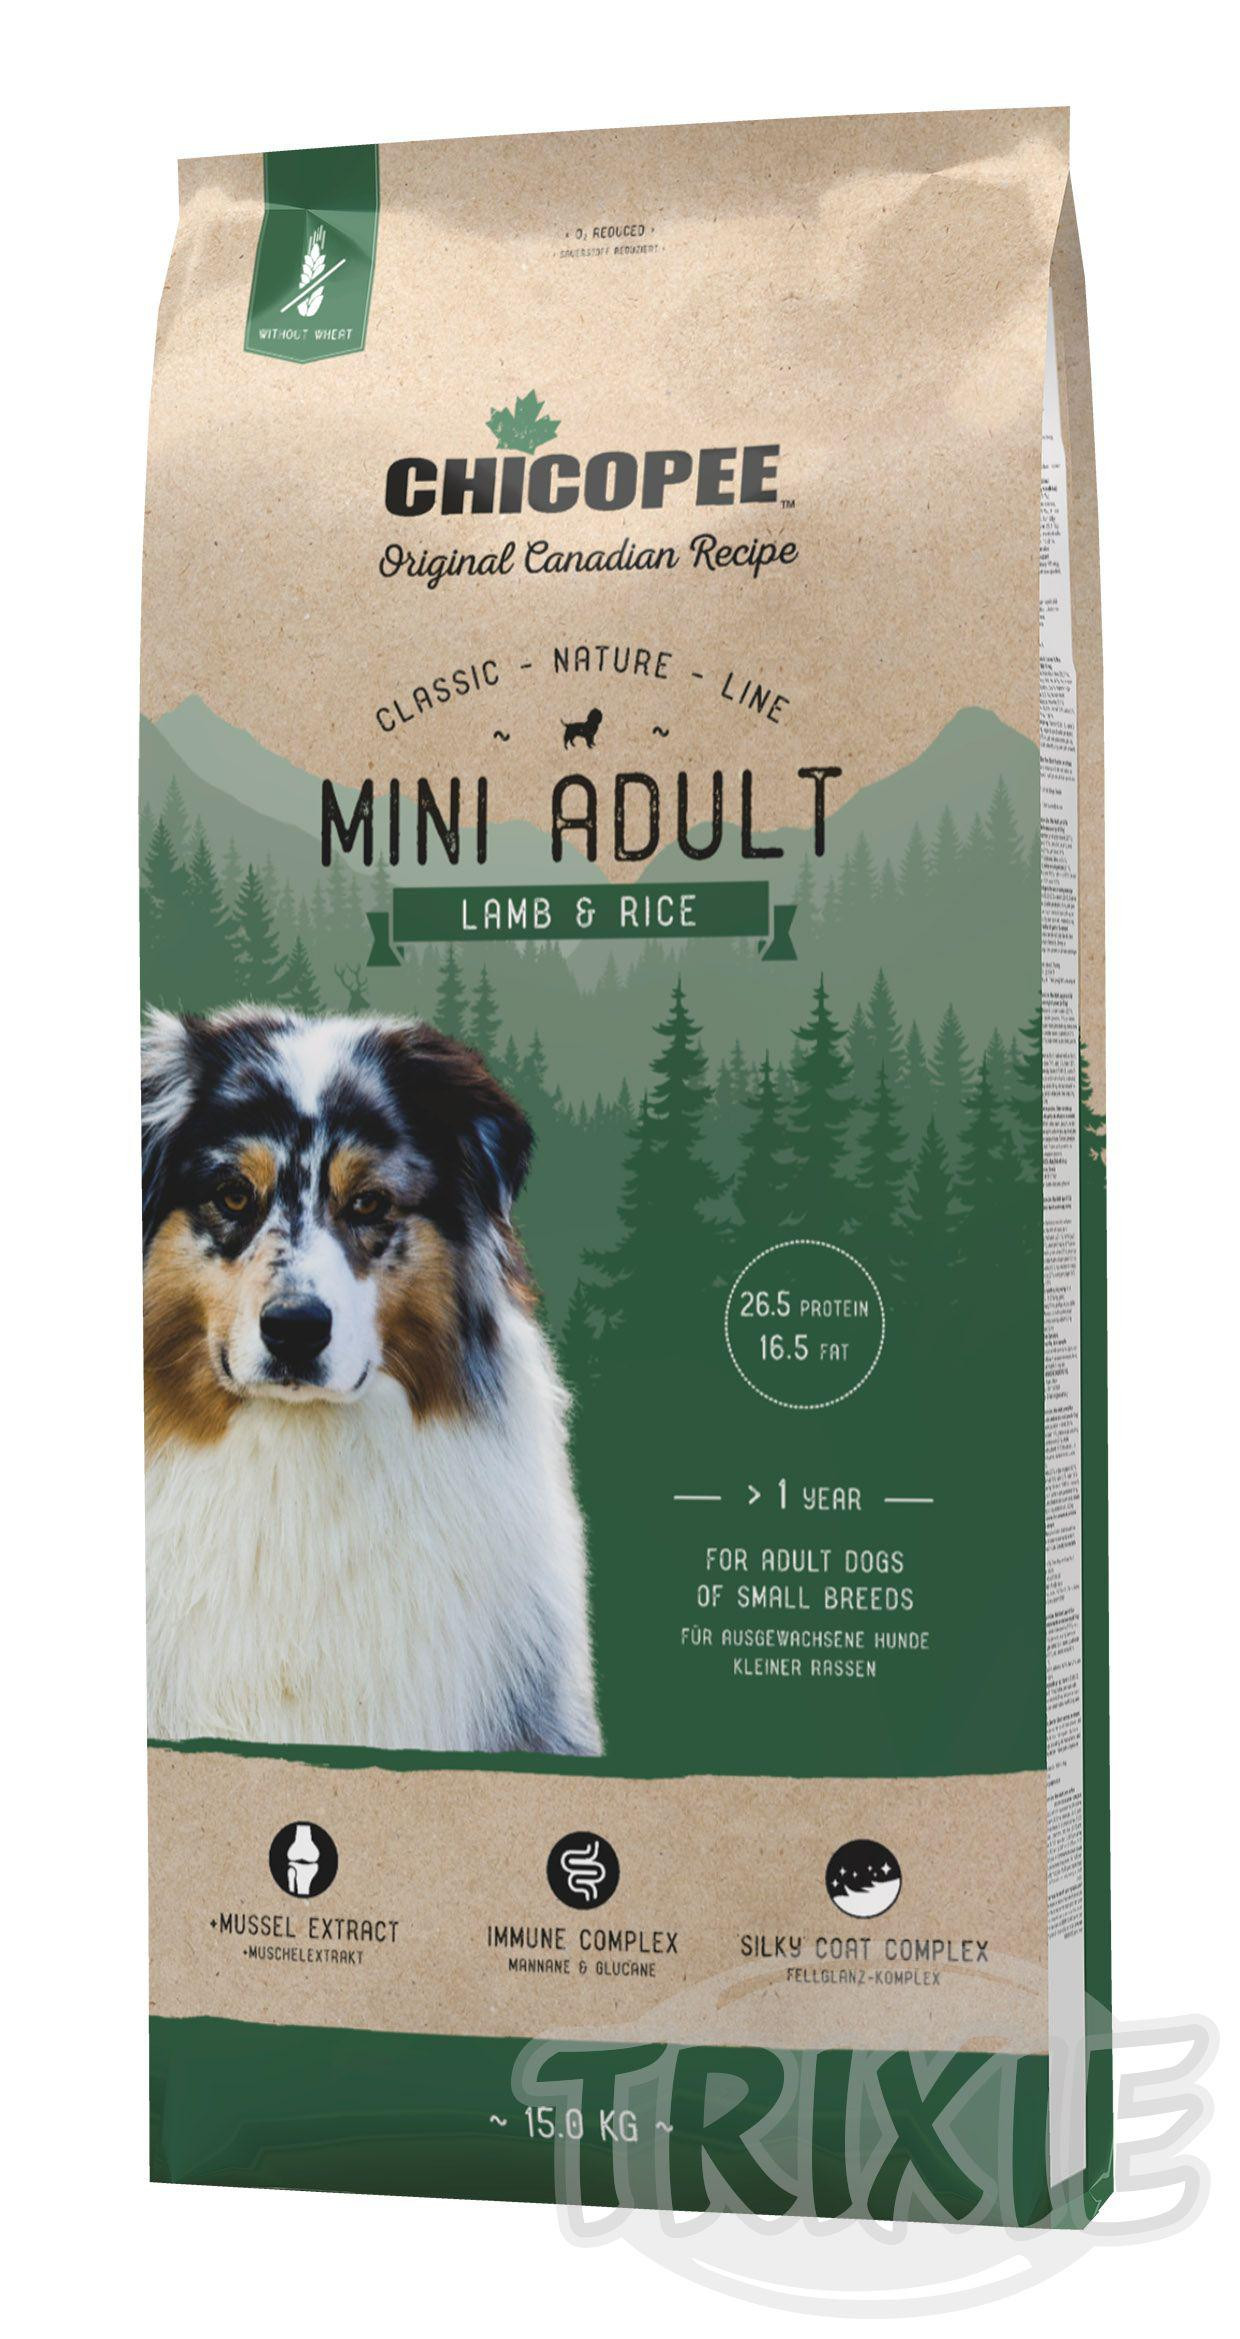 CHICOPEE CN ADULT MINI lamb/rice 15kg